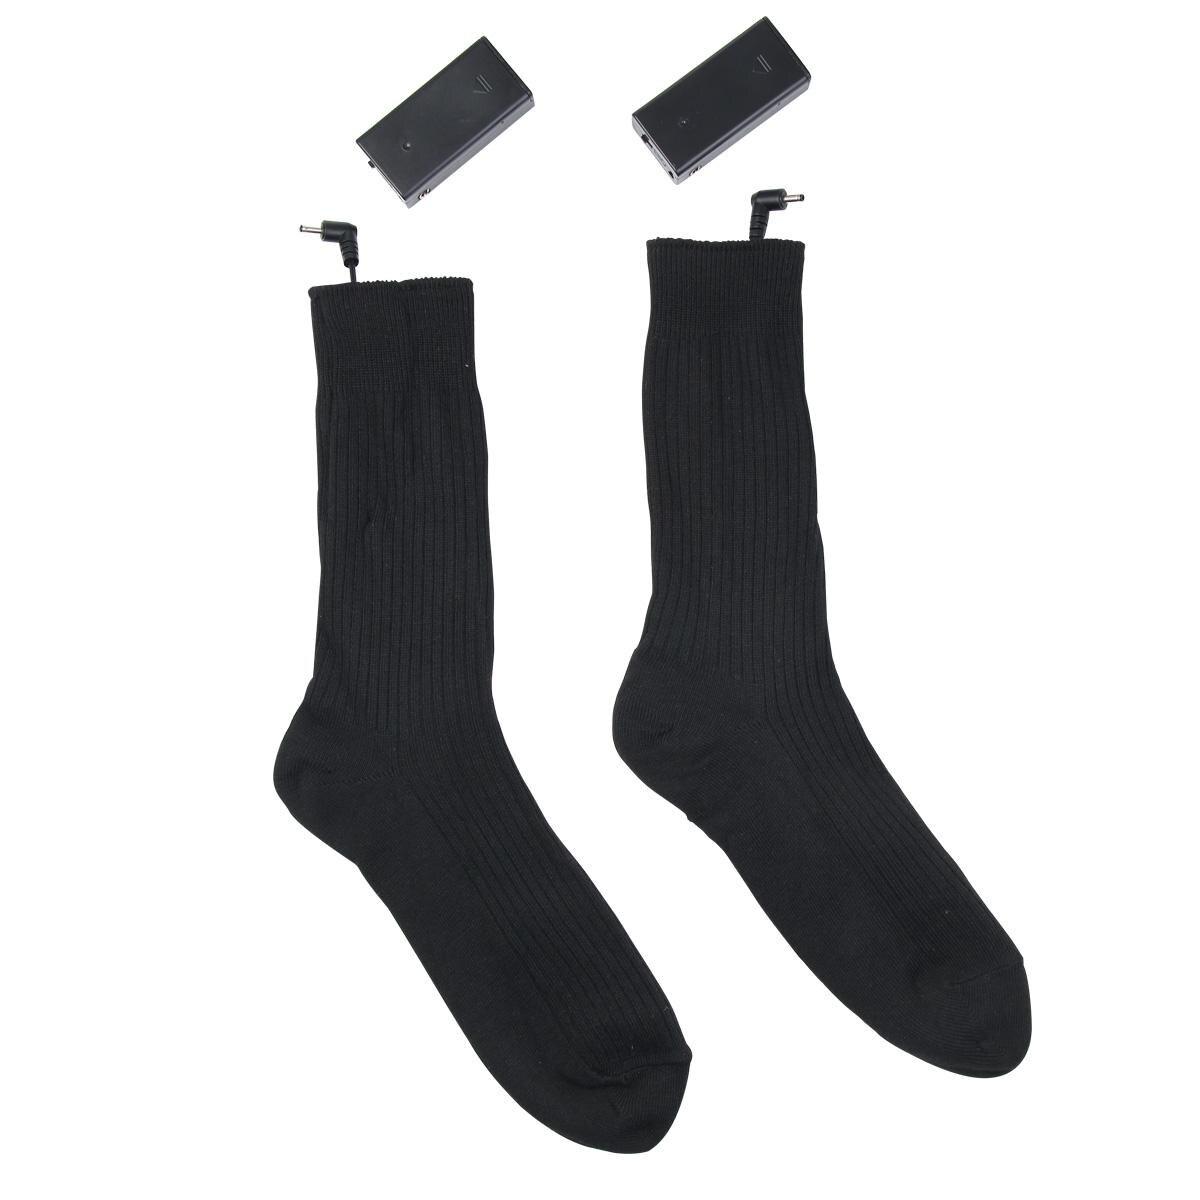 Warmski Unisex Thermal Cotton Heated Socks 5